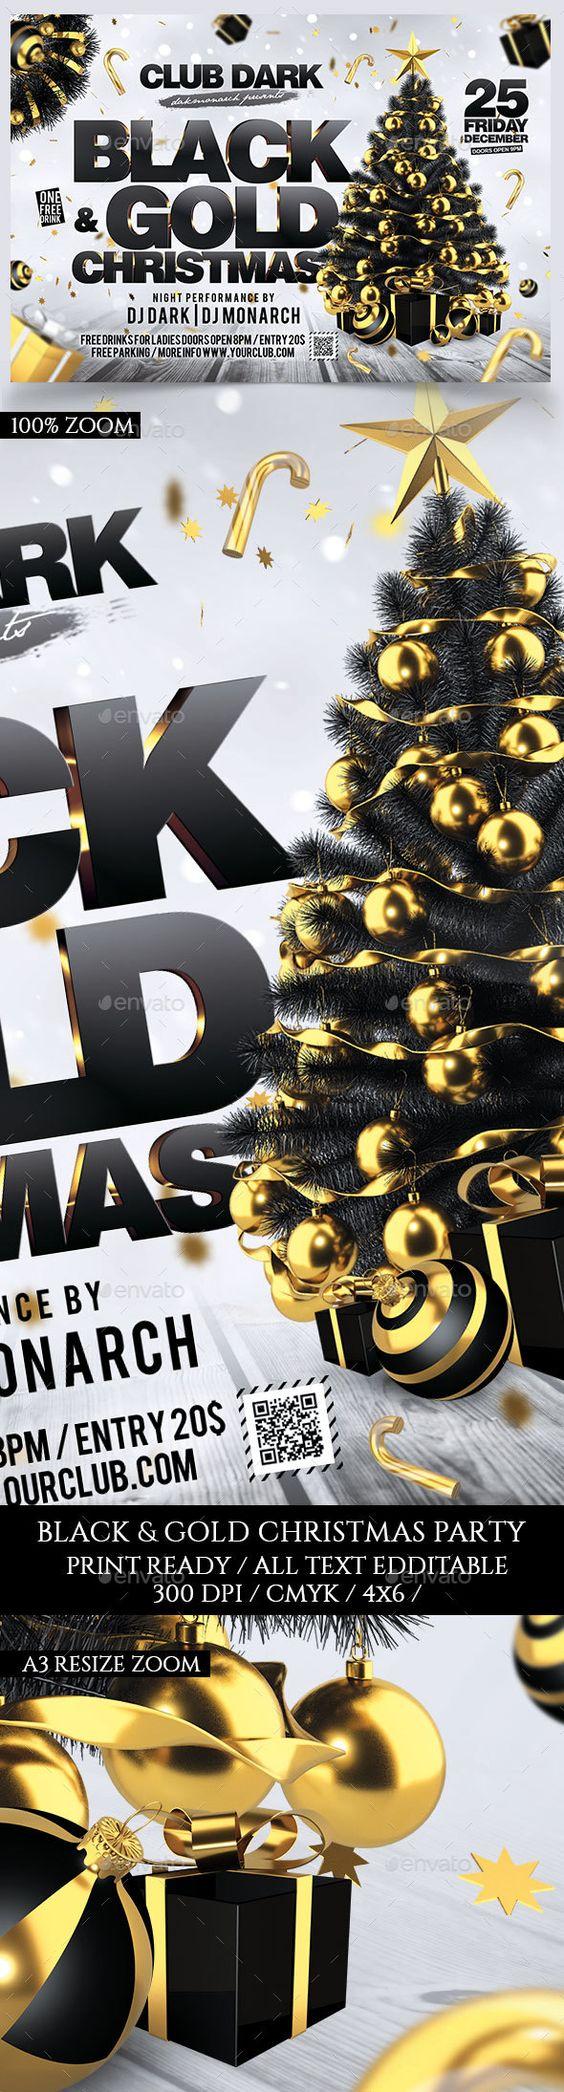 black and gold christmas black gold christmas holidays and black and gold christmas flyer design template holidays events flyer design template psd